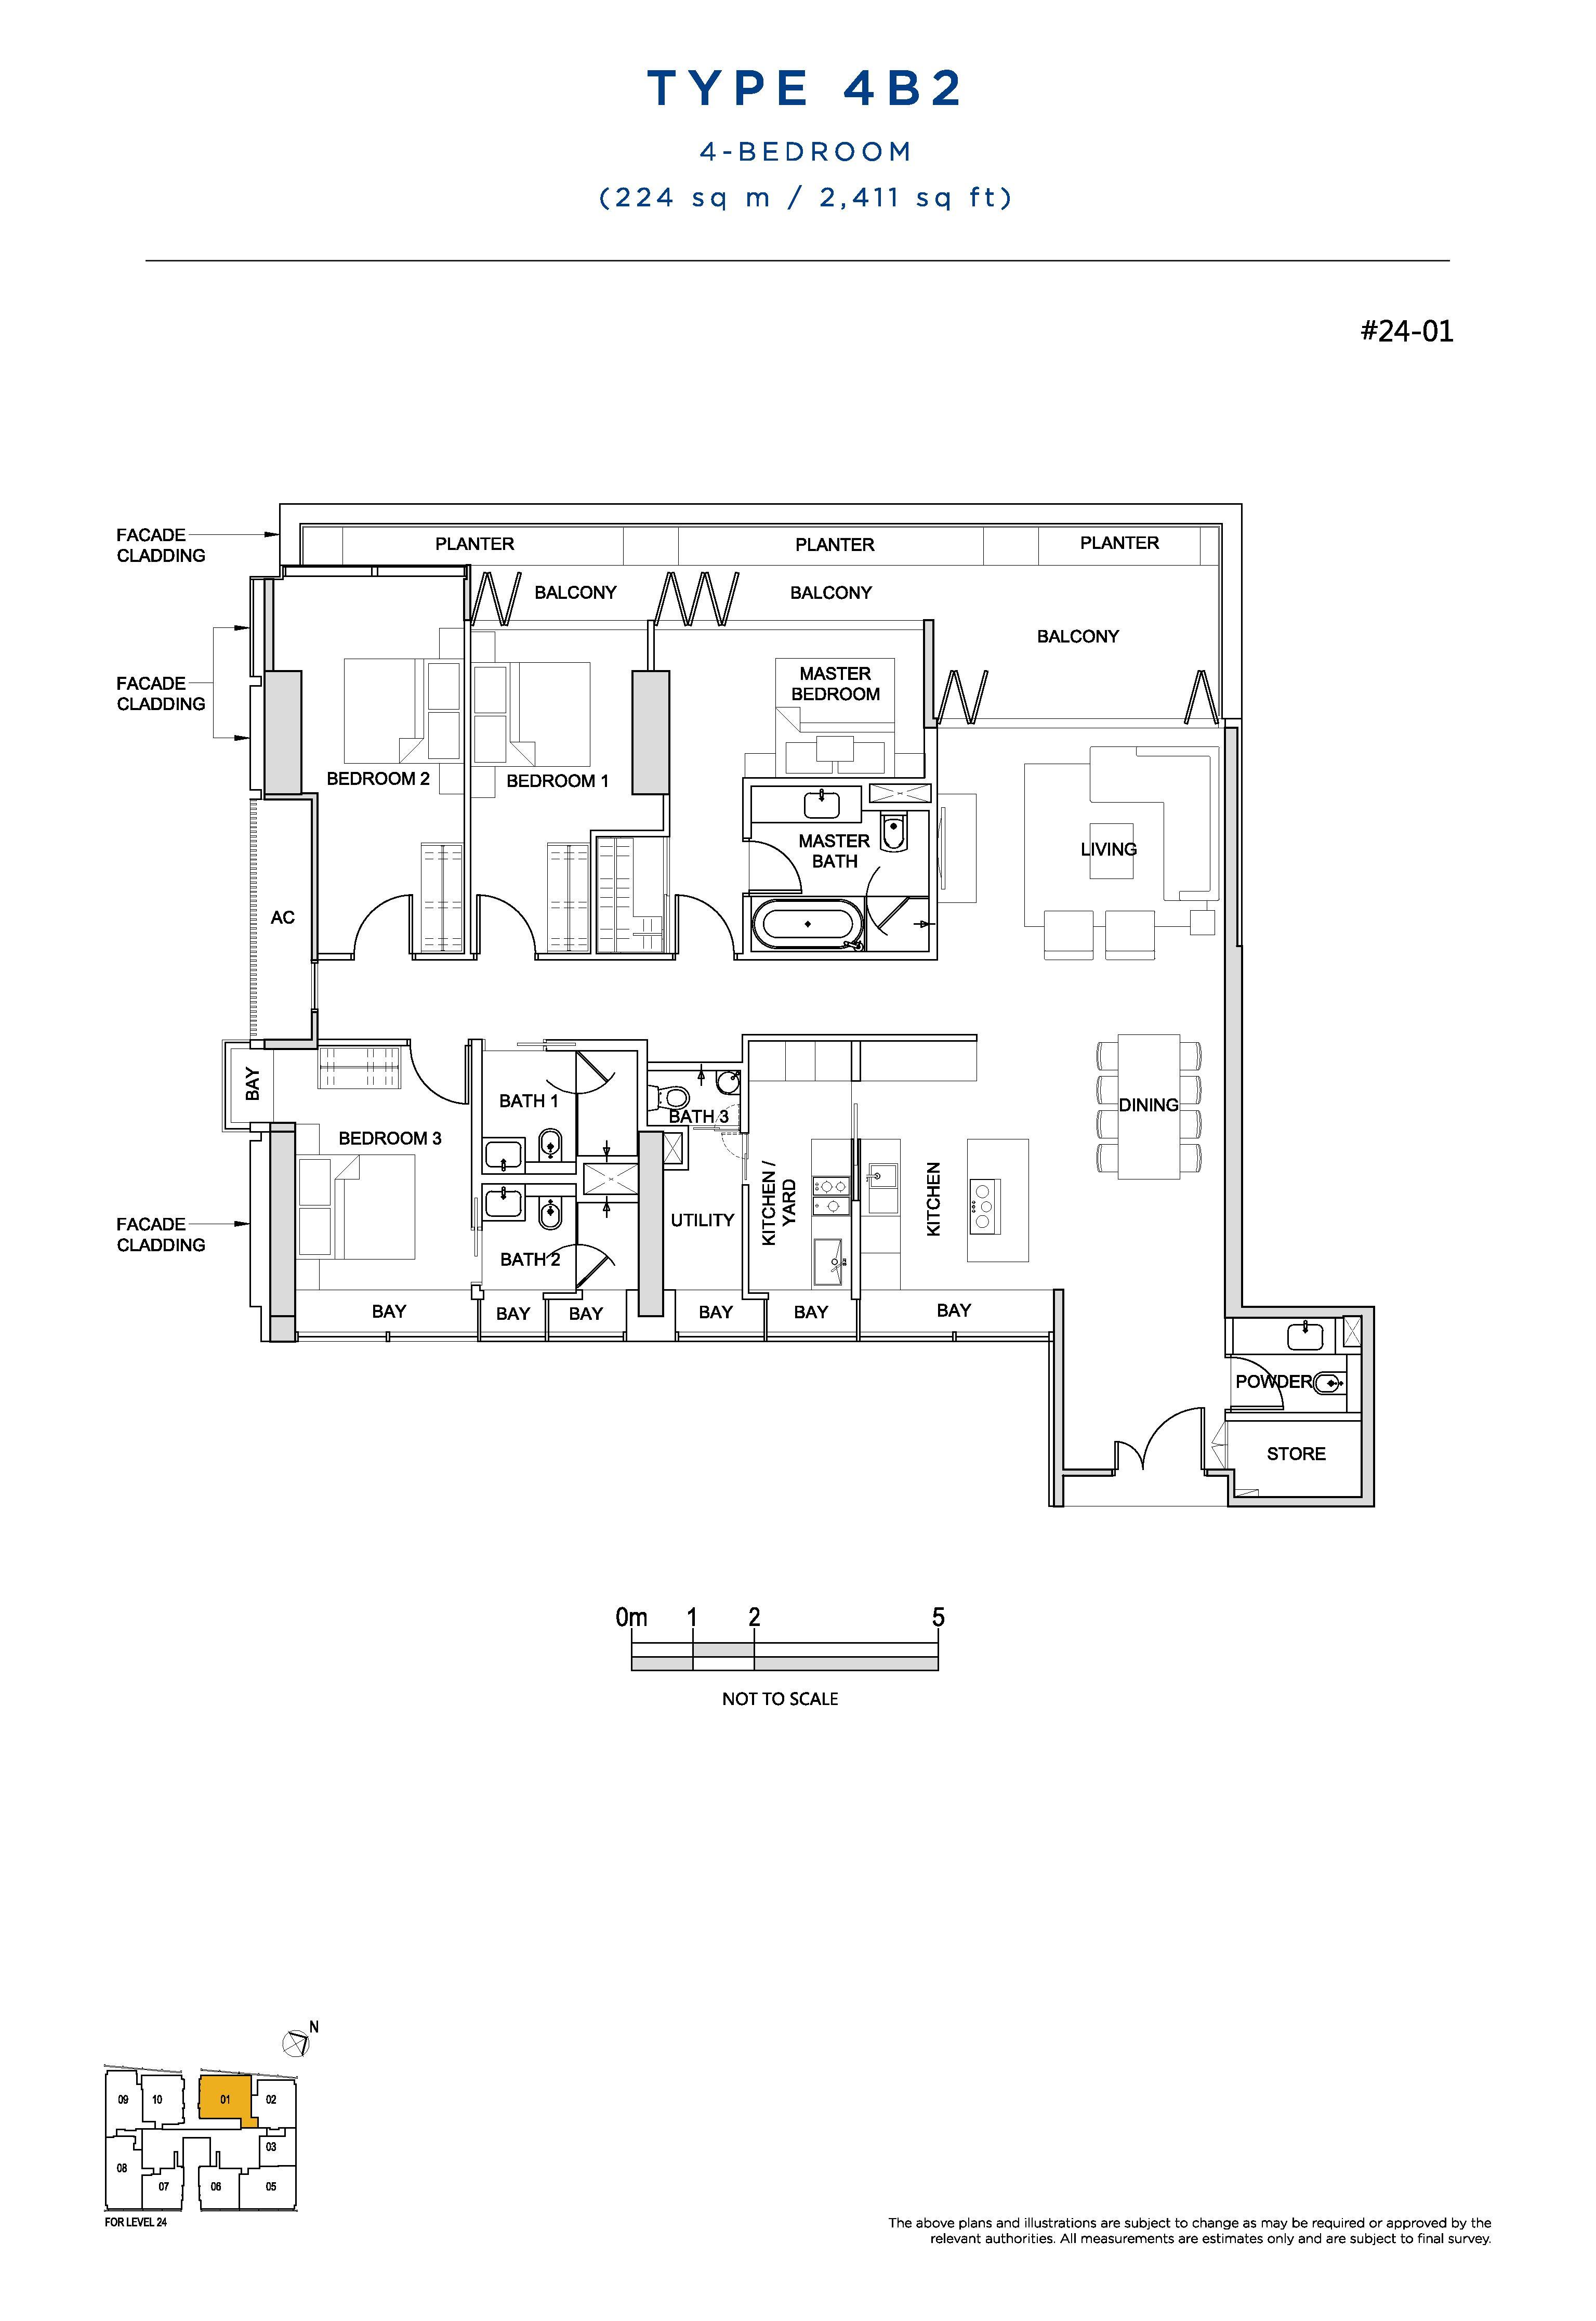 South Beach Residences 4 Bedroom Floor Plans Type 4B2